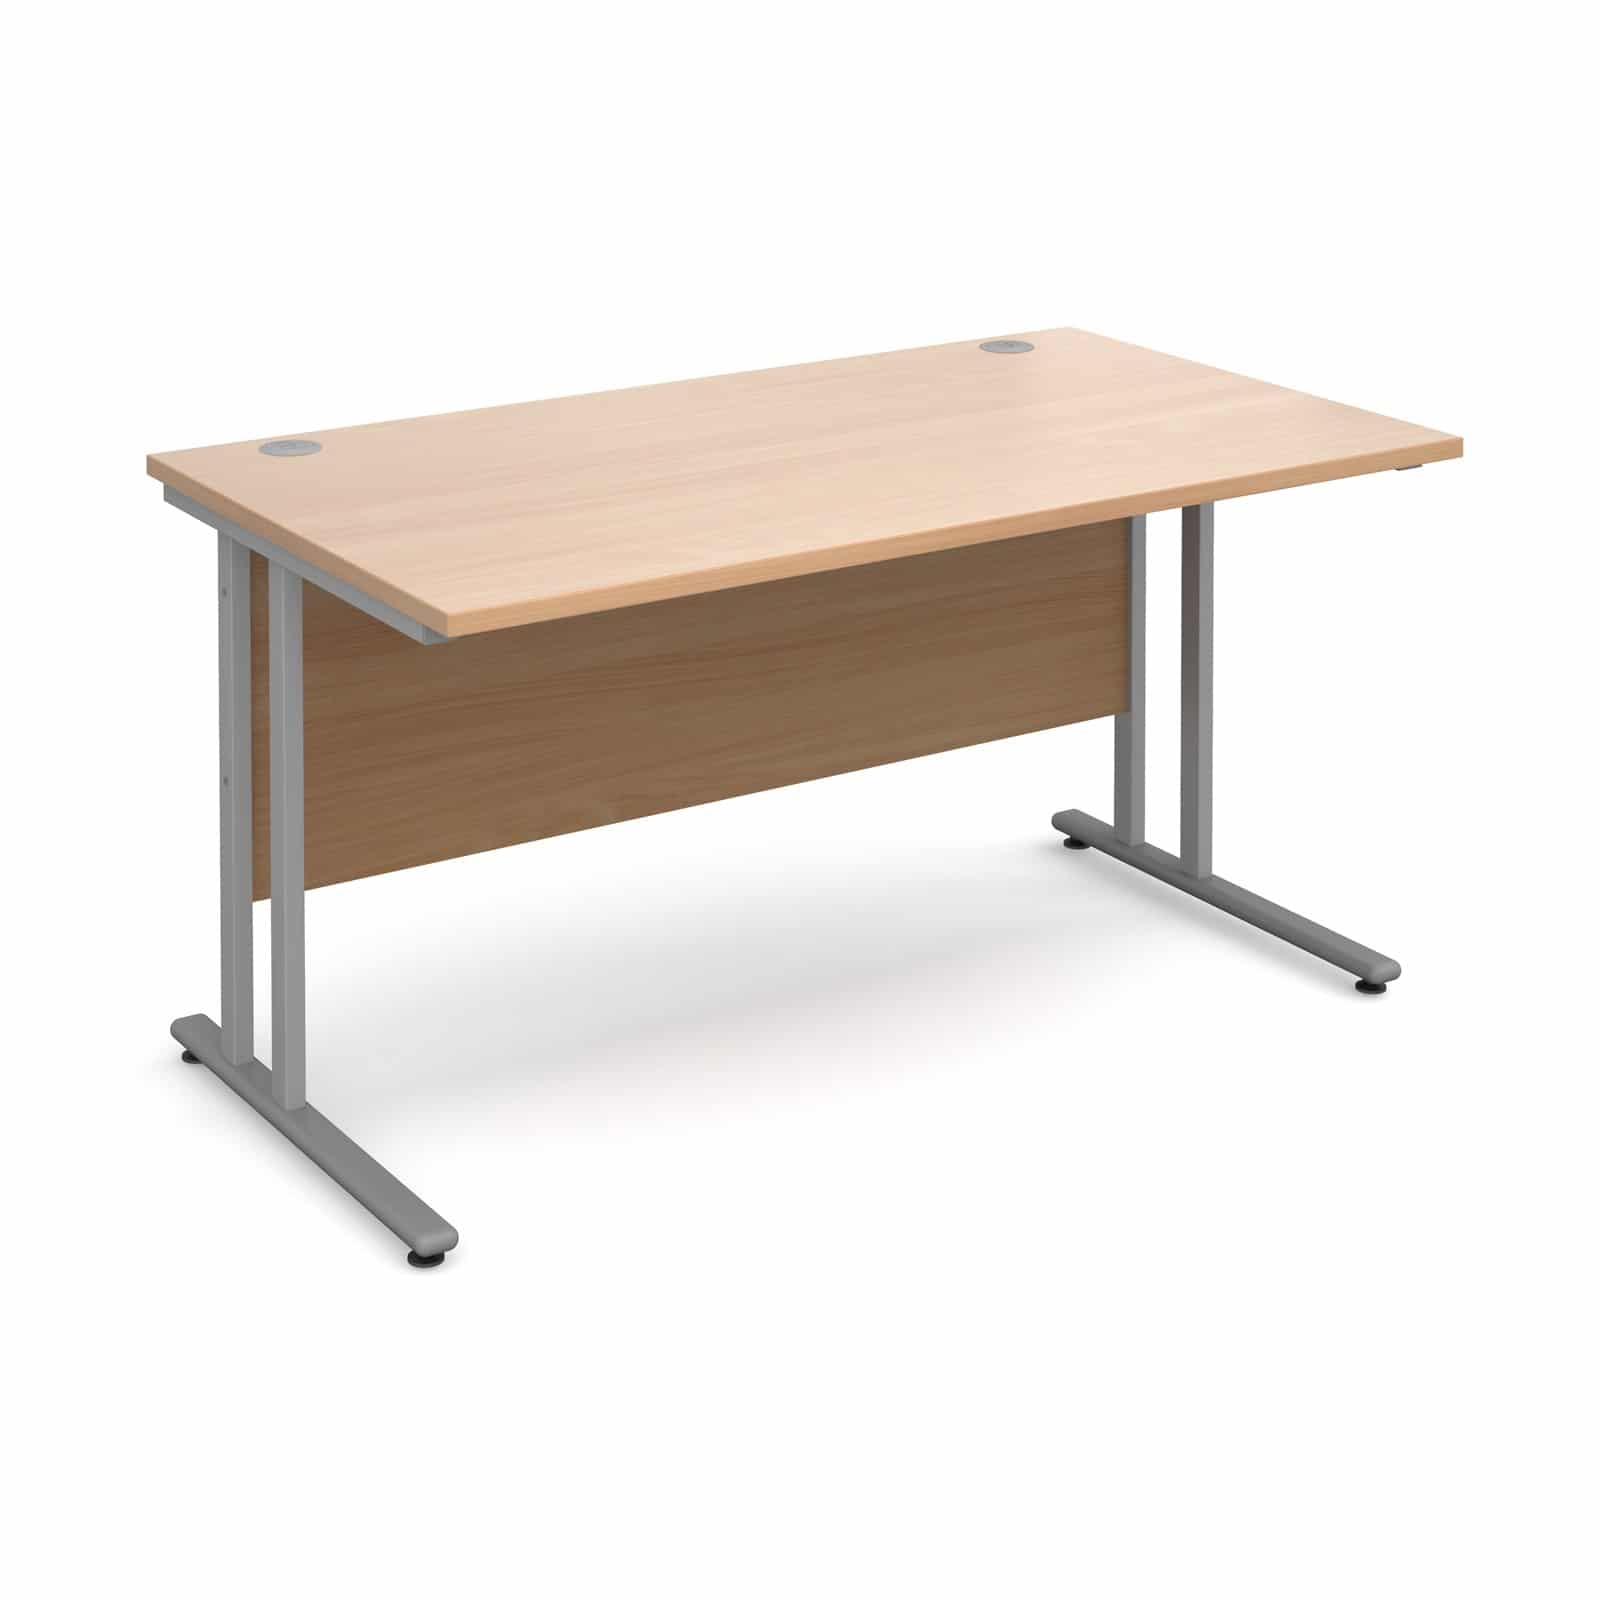 Office Desks Online : Shop Straight Desks at BIMI.co